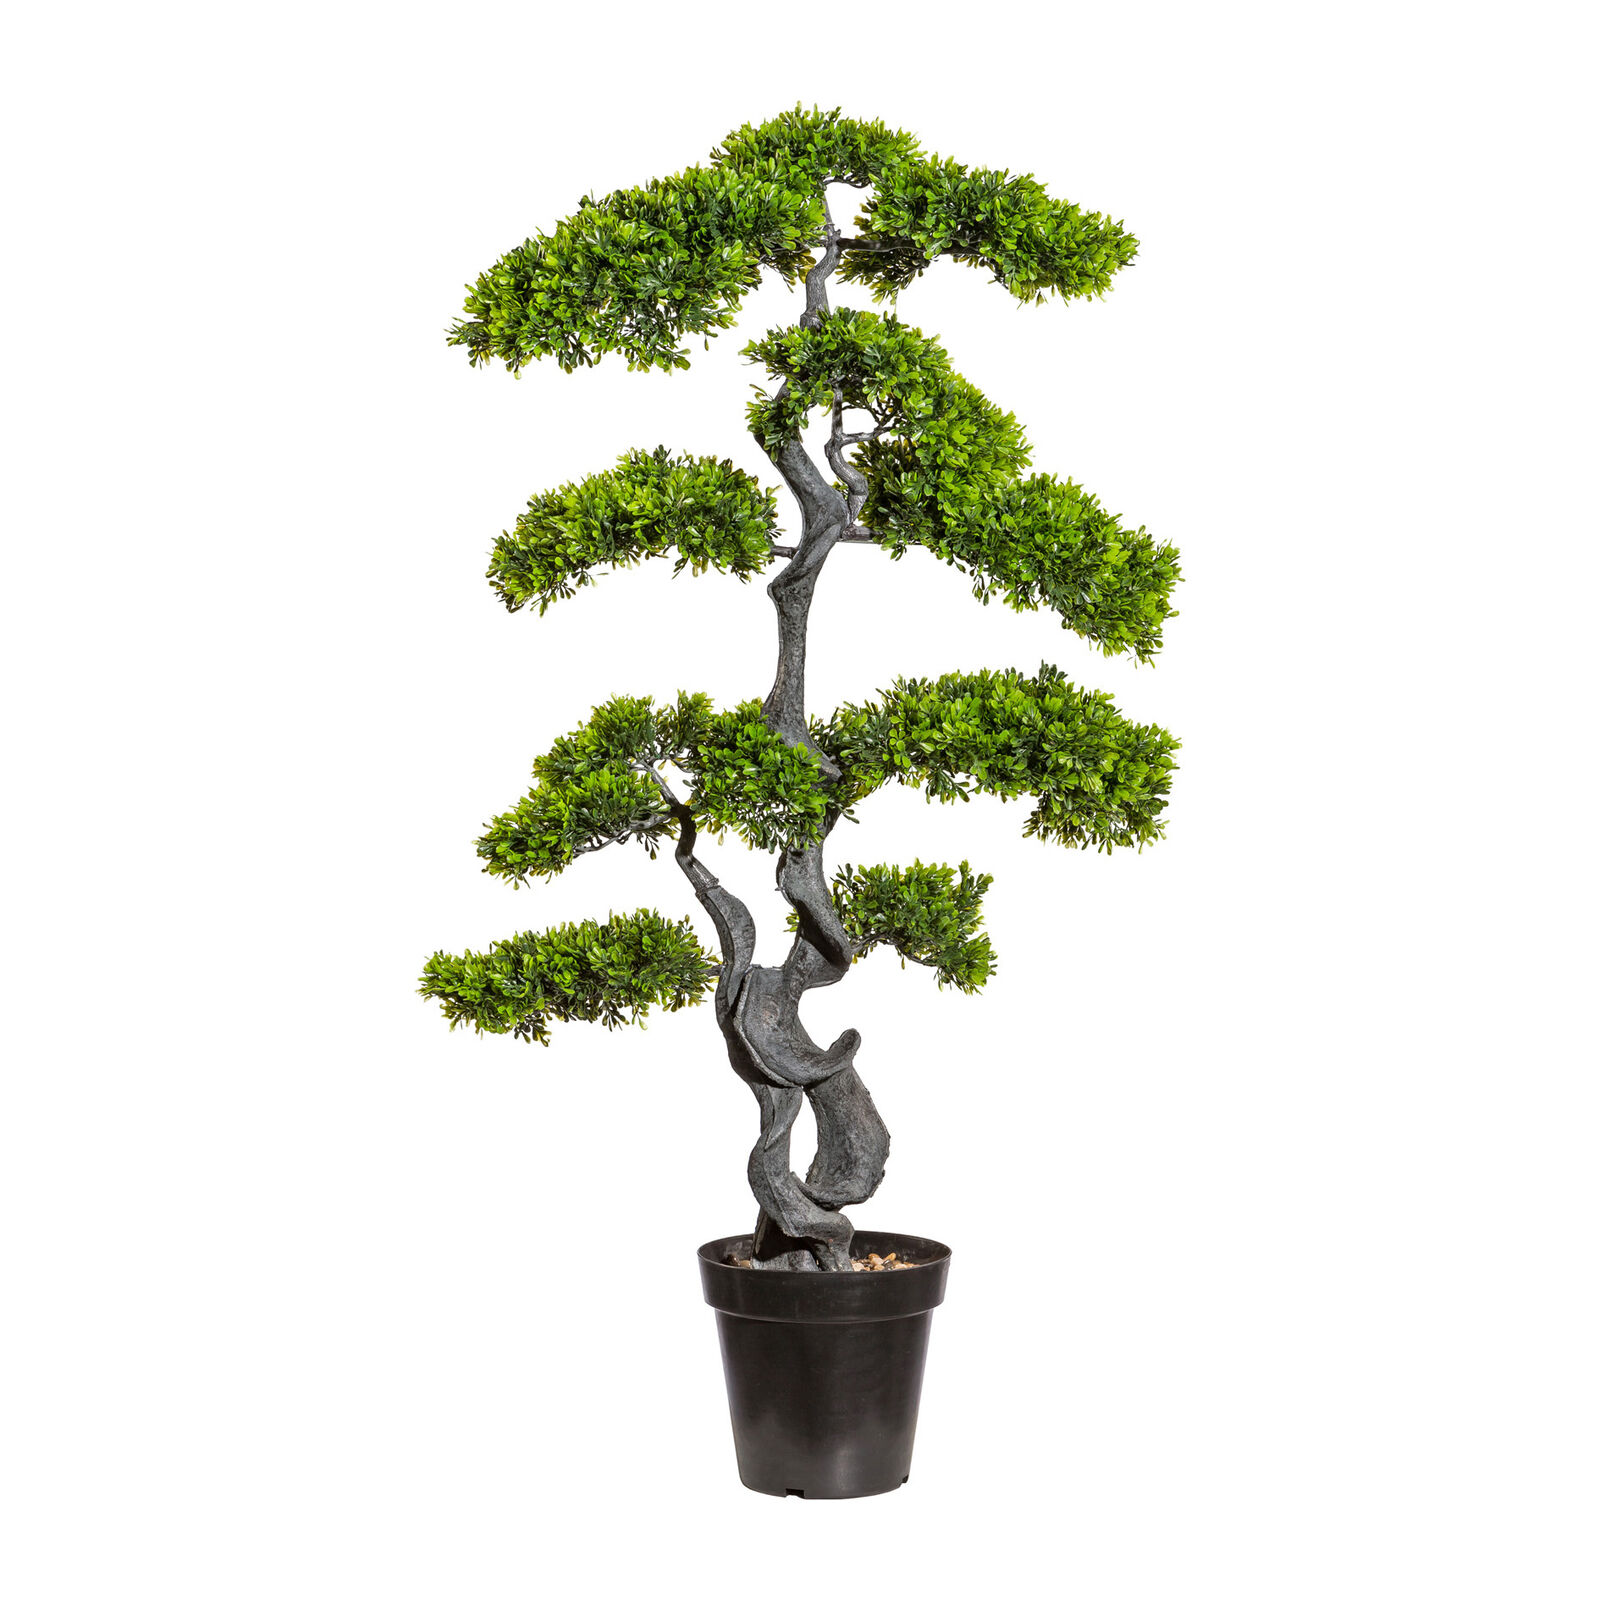 Kunstpflanze Bonsai Teeblatt grün, inklusive Kunststoff-Topf, Höhe ca. 125 cm